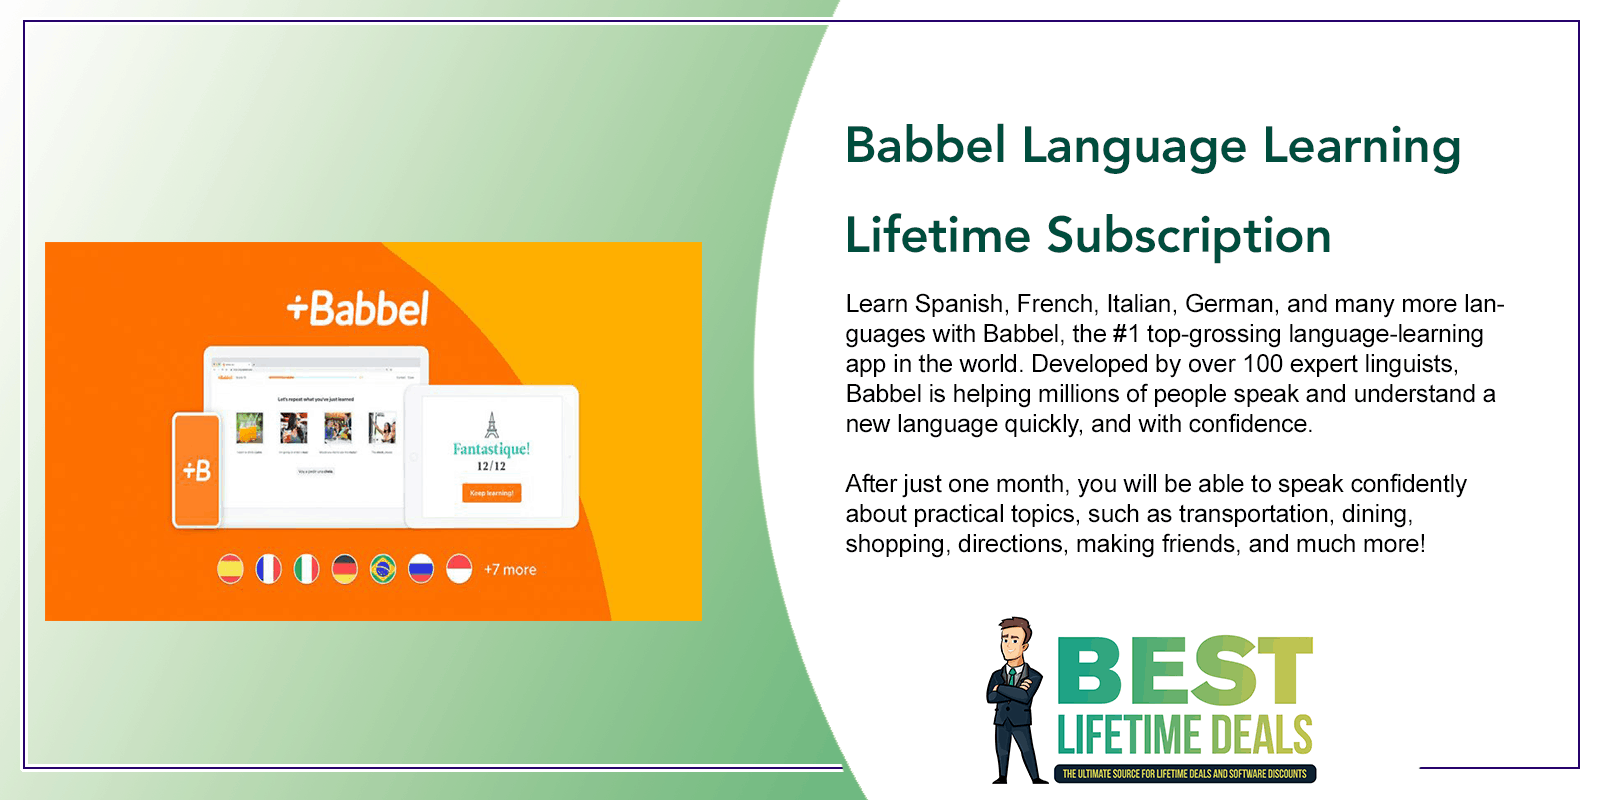 Babbel Language Learning Lifetime Subscription Post Image